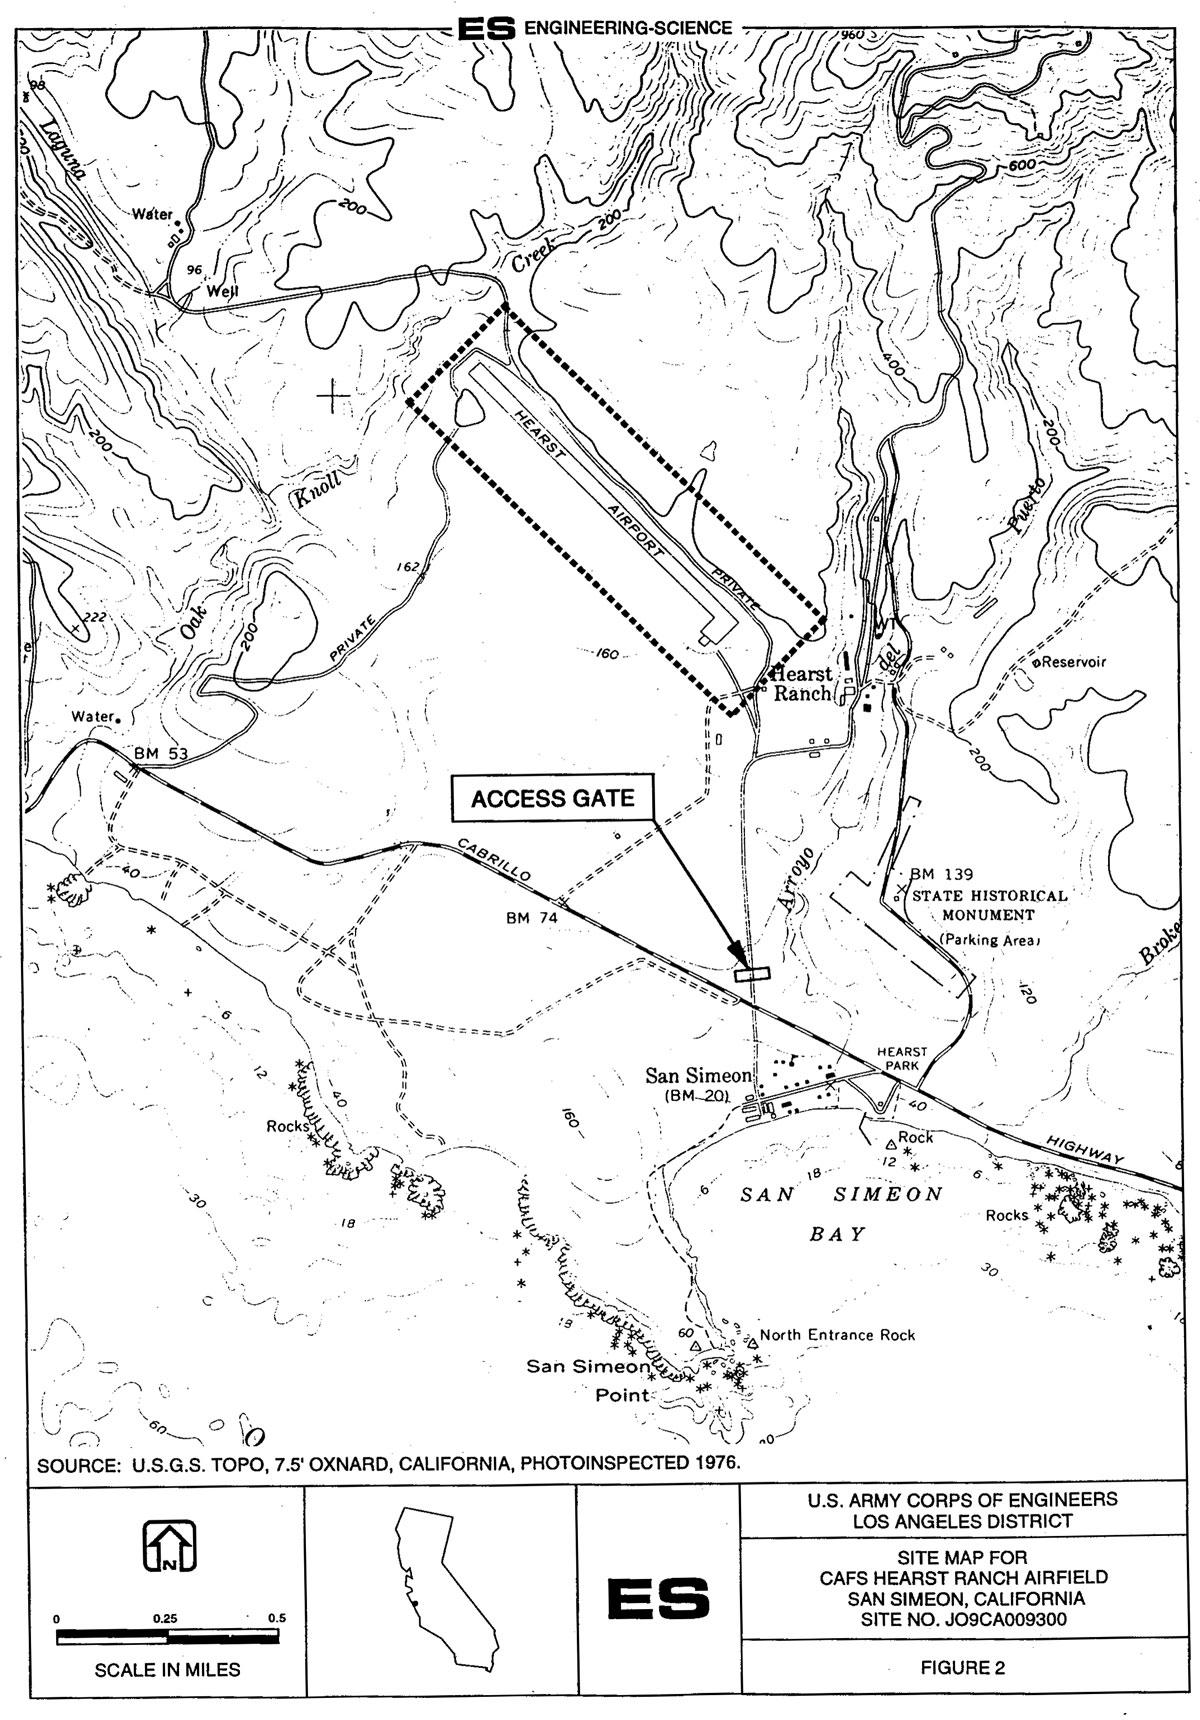 Hearst Ranch Airfield